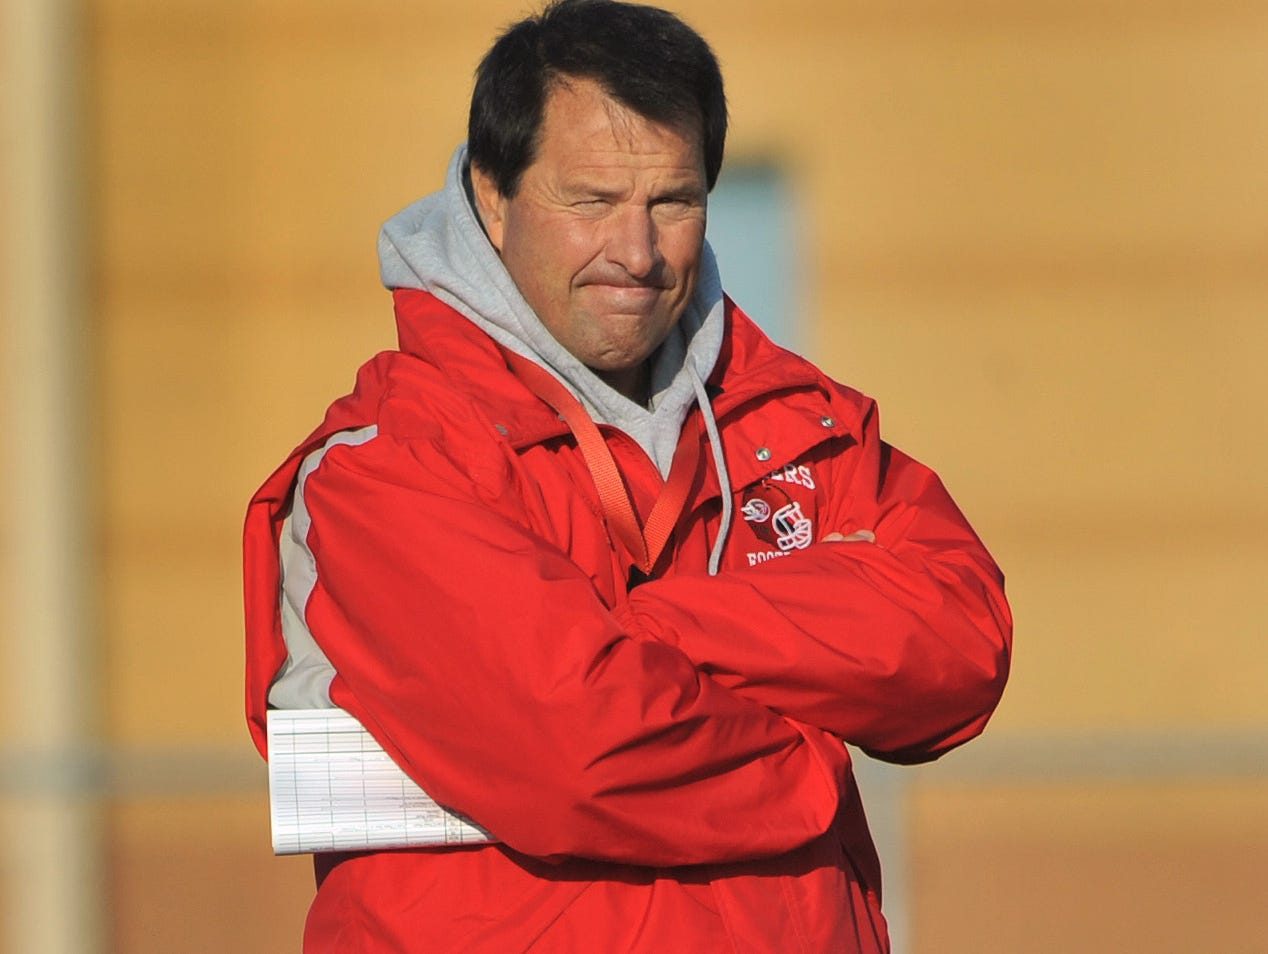 Fishers High School football head coach Rick Wimmer at practice Wednesday November 7, 2012. Joe Vitti / The Star